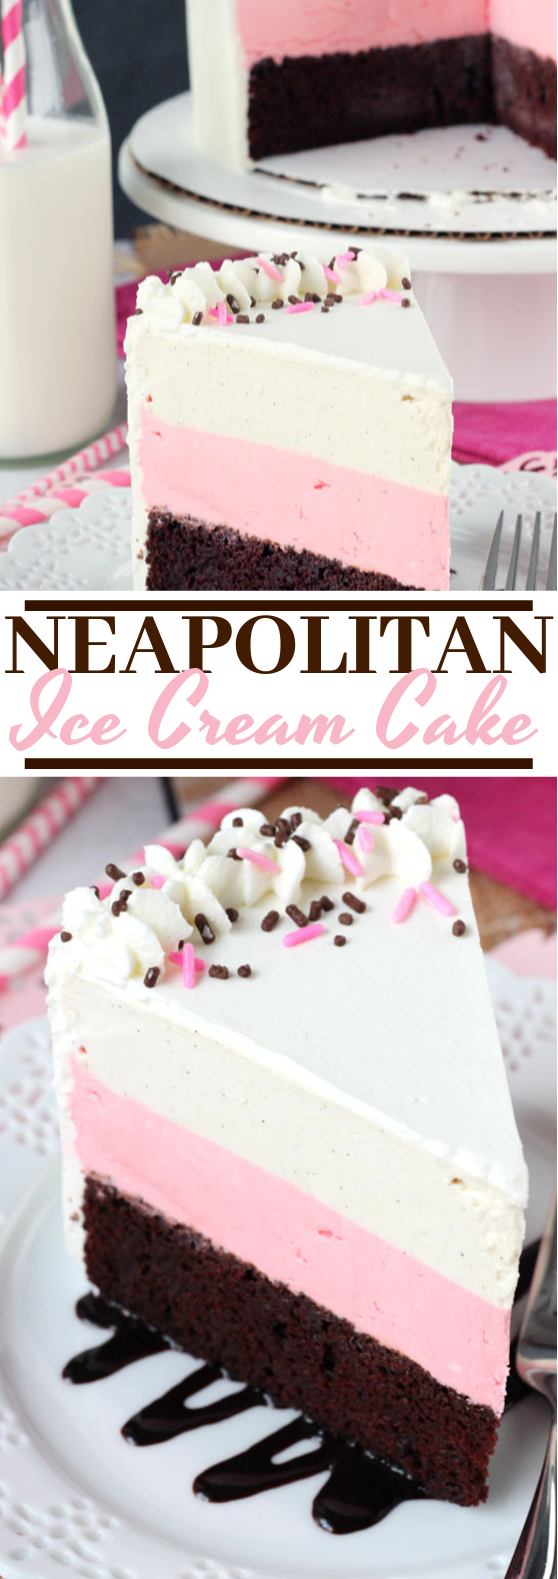 Neapolitan Ice Cream Cake #desserts #cake